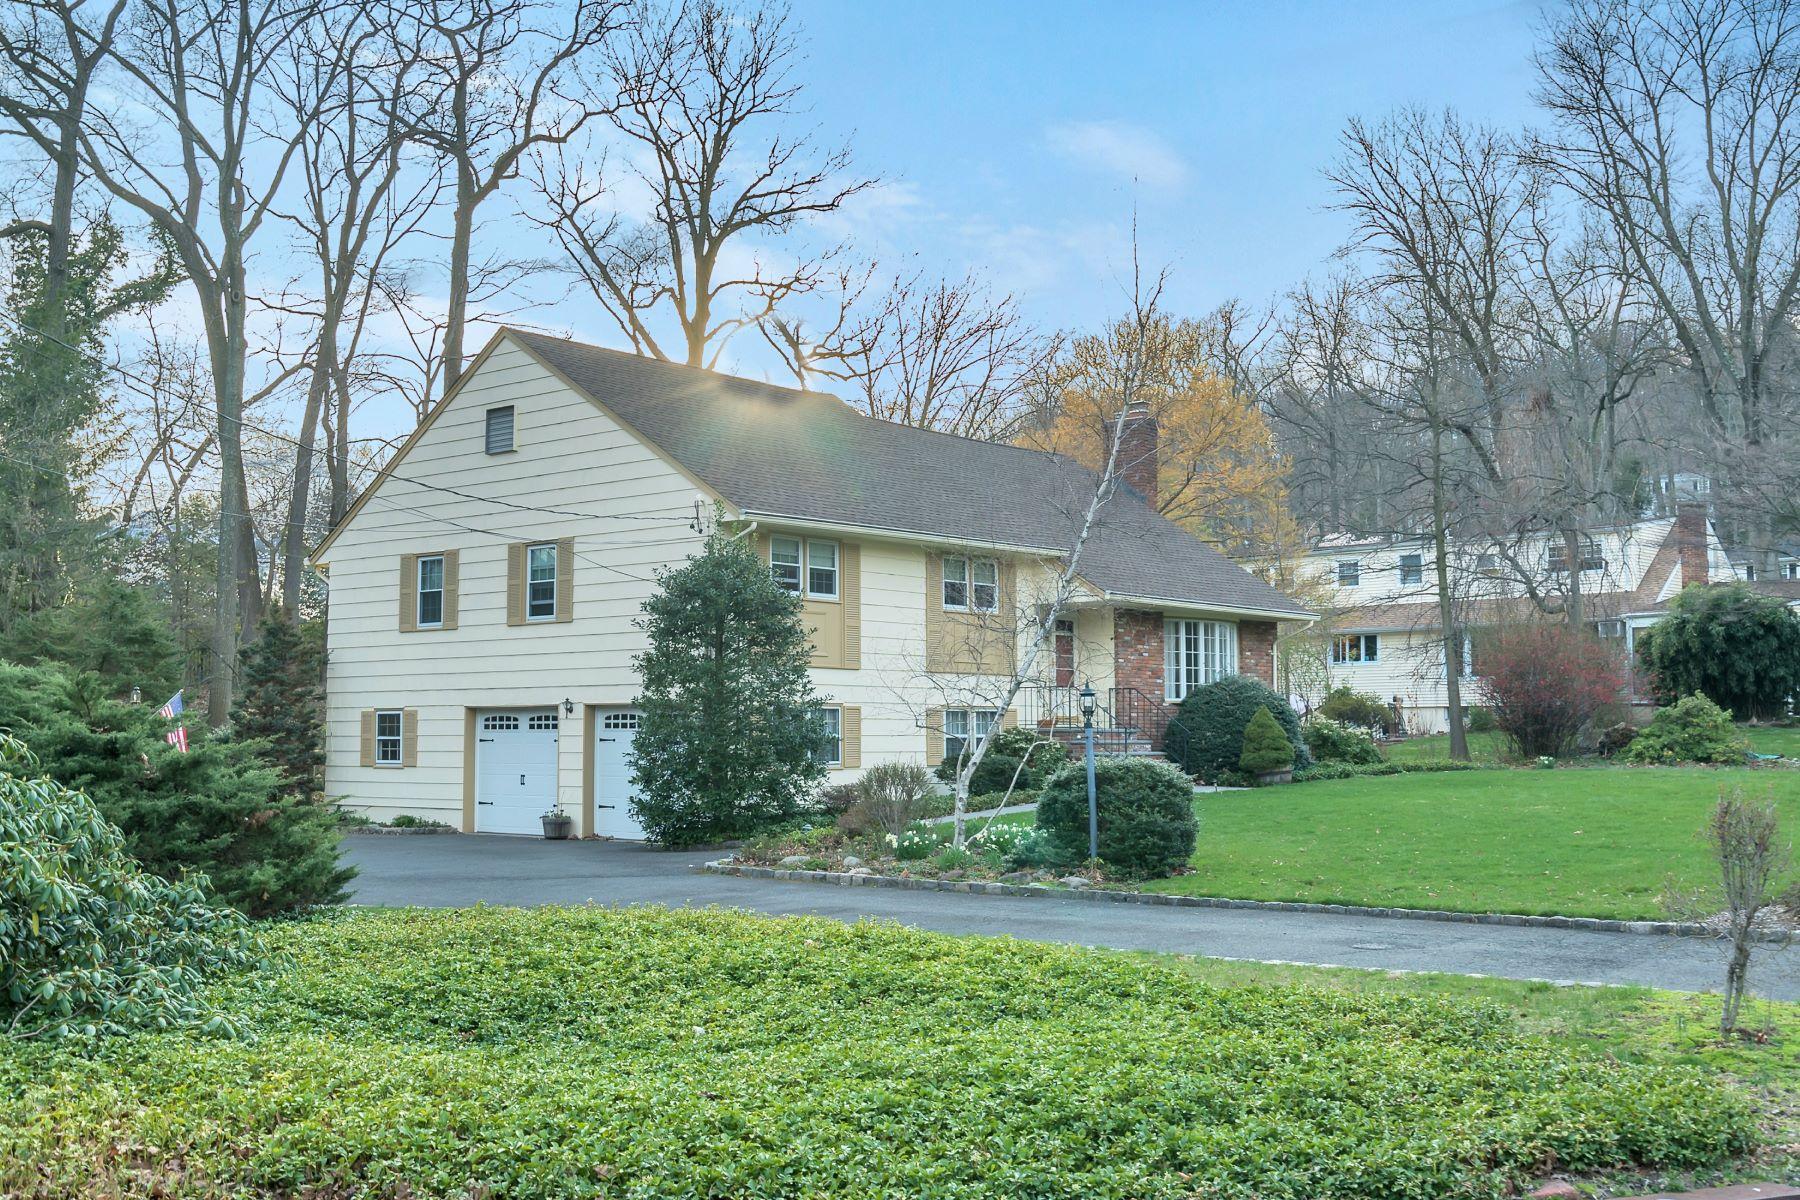 Casa Unifamiliar por un Venta en Charming Home 301 Meeting House Lane Mountainside, Nueva Jersey 07092 Estados Unidos